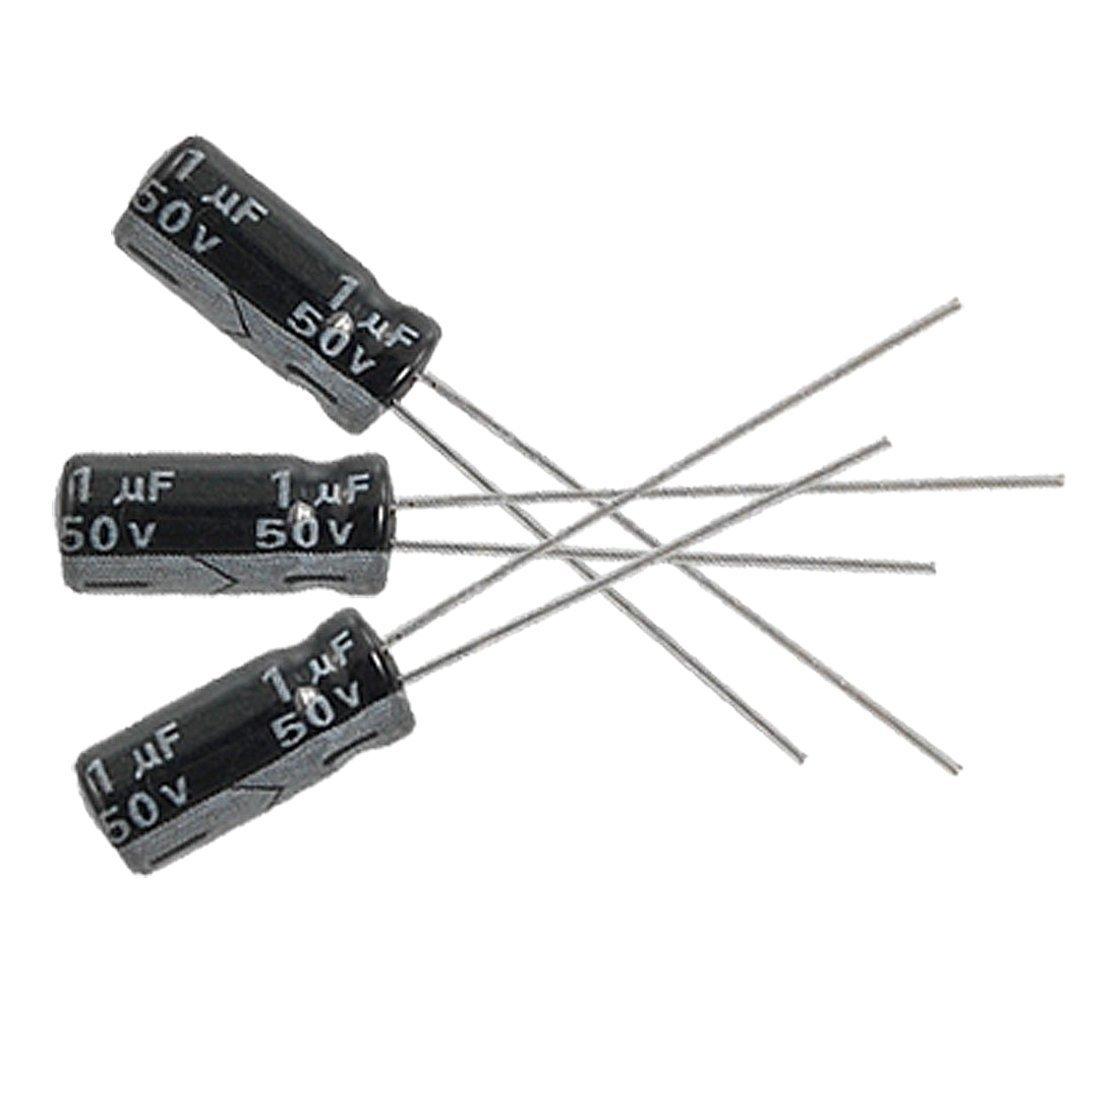 Electrolytic Capacitors - SODIAL(R) 10 x 1uF 50V 105C Radial Electrolytic Capacitor 5x11mm